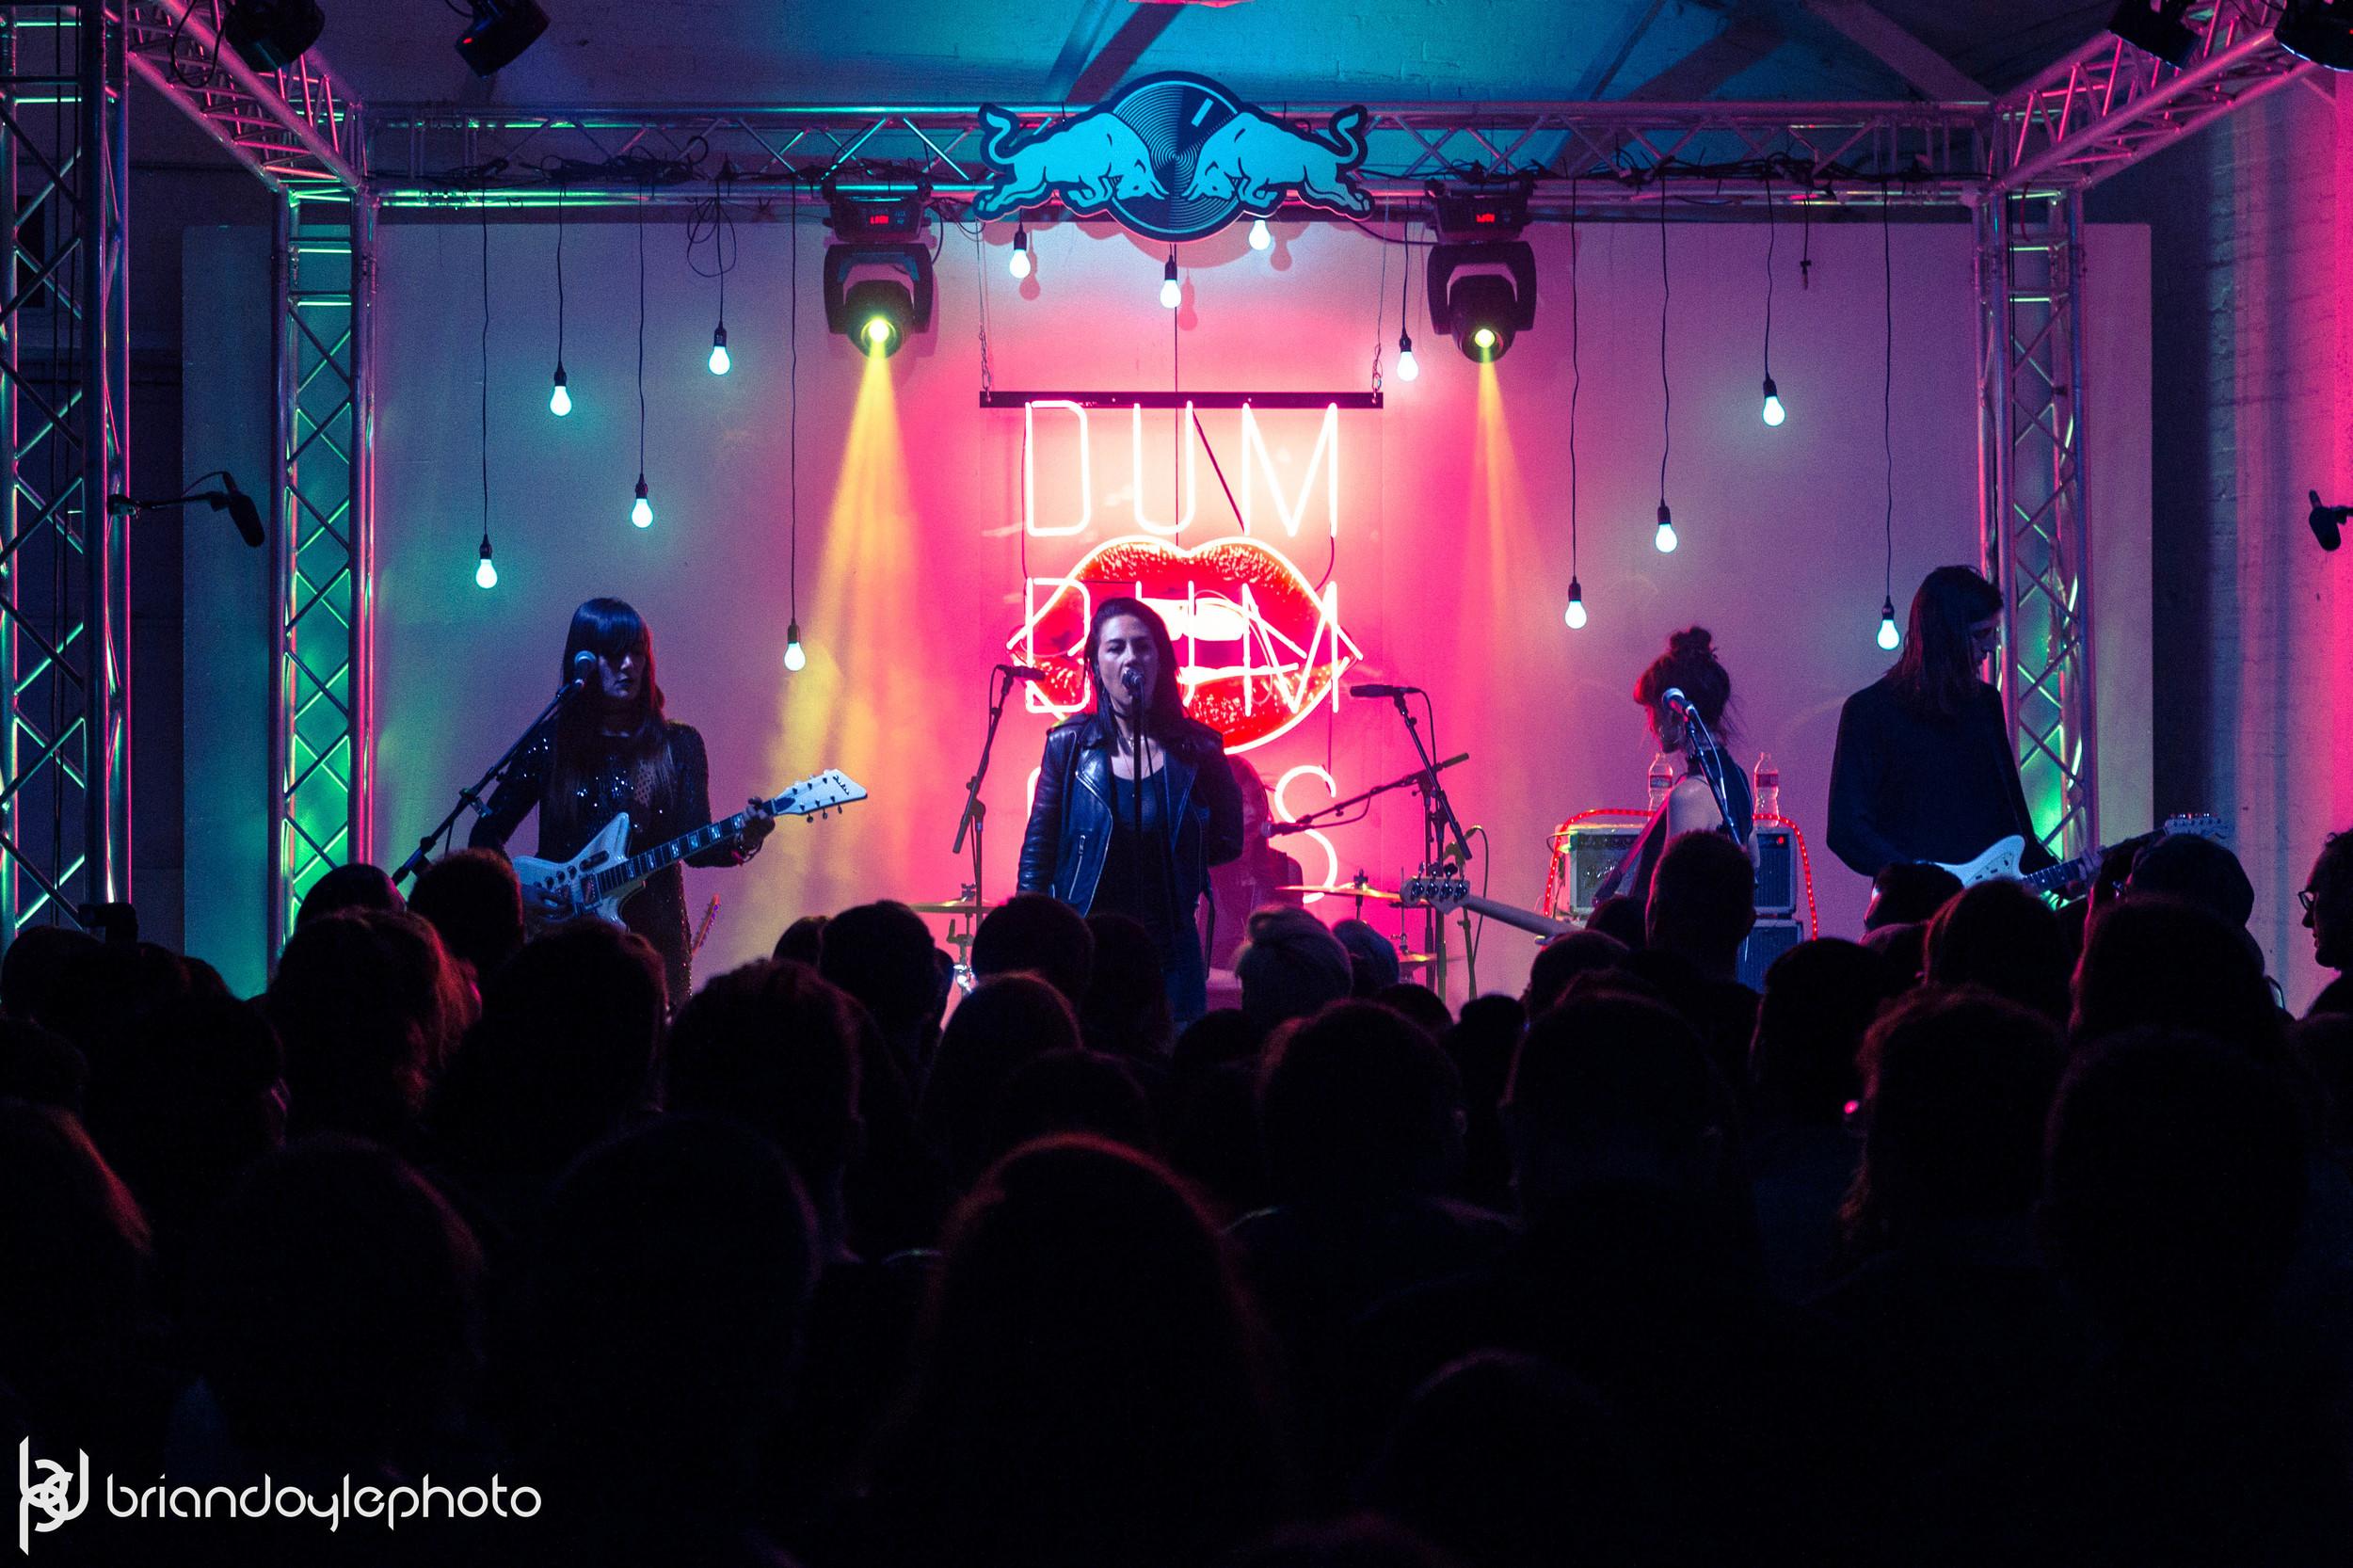 Red Bull - Dum Dum Girls, Tropicana and the Flea, Lowell @ The Well 2014.11.16-59.jpg